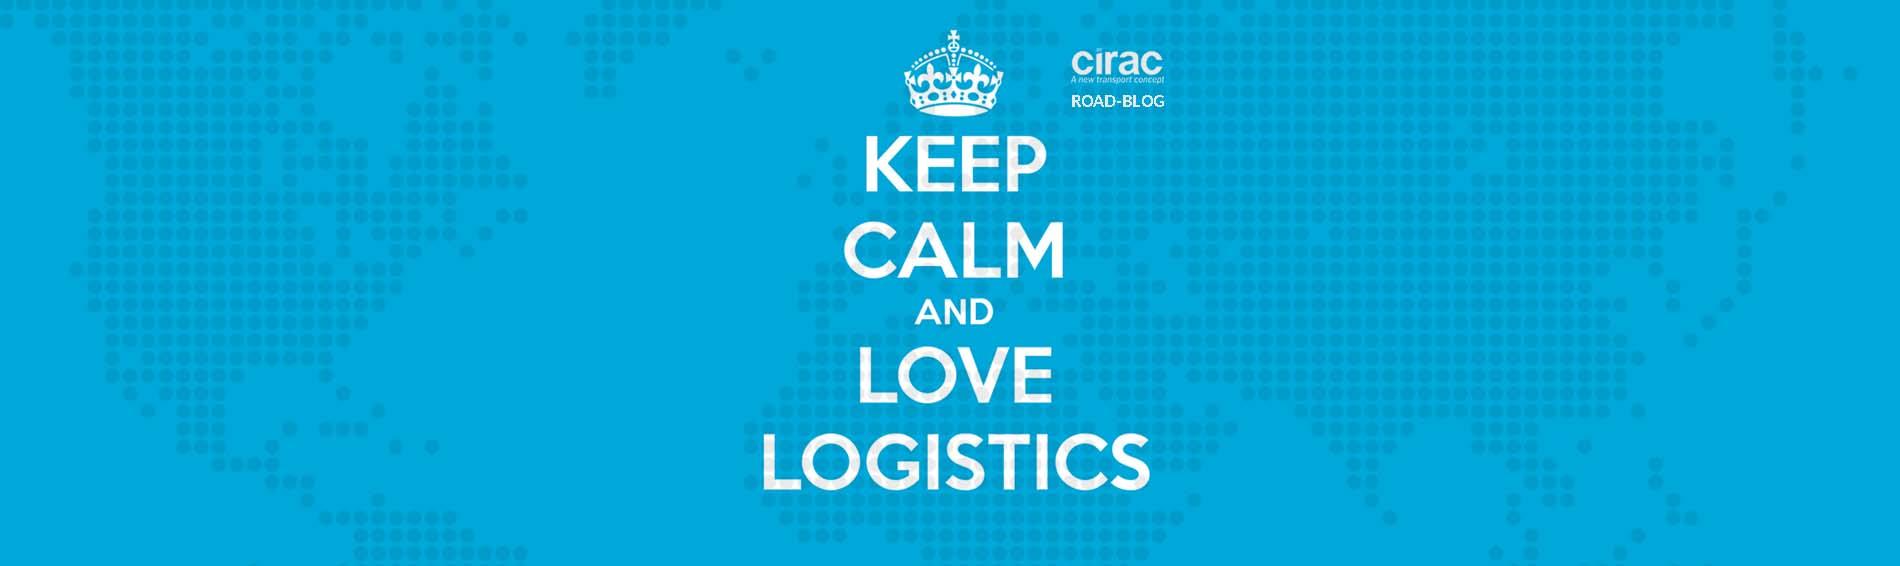 love-logistics